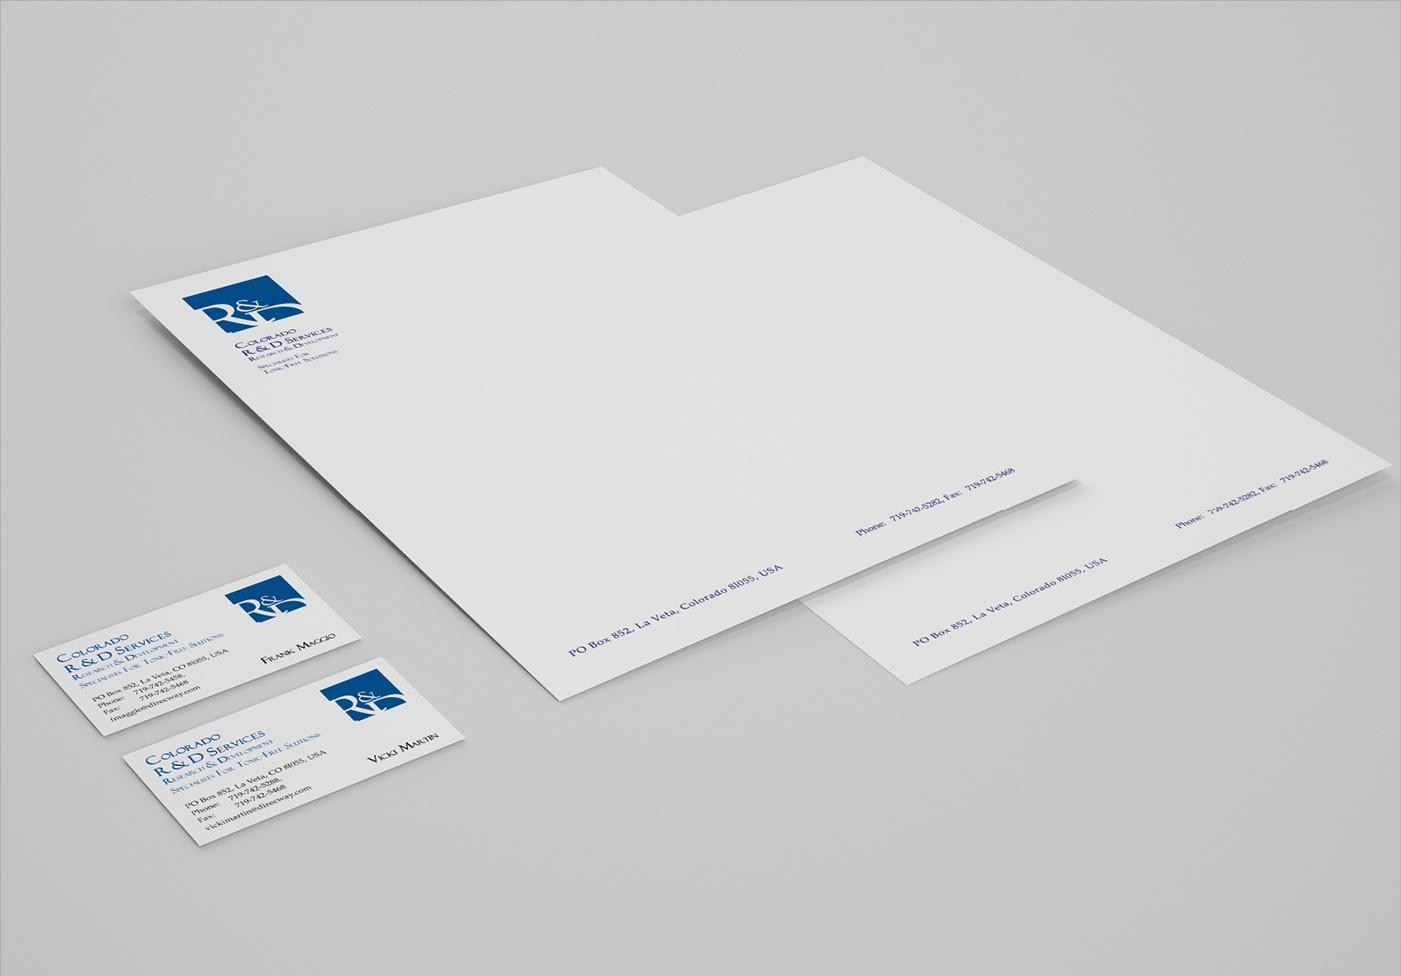 R & D Services: Corporate Design, Logo, Briefbogen, Visitenkarte